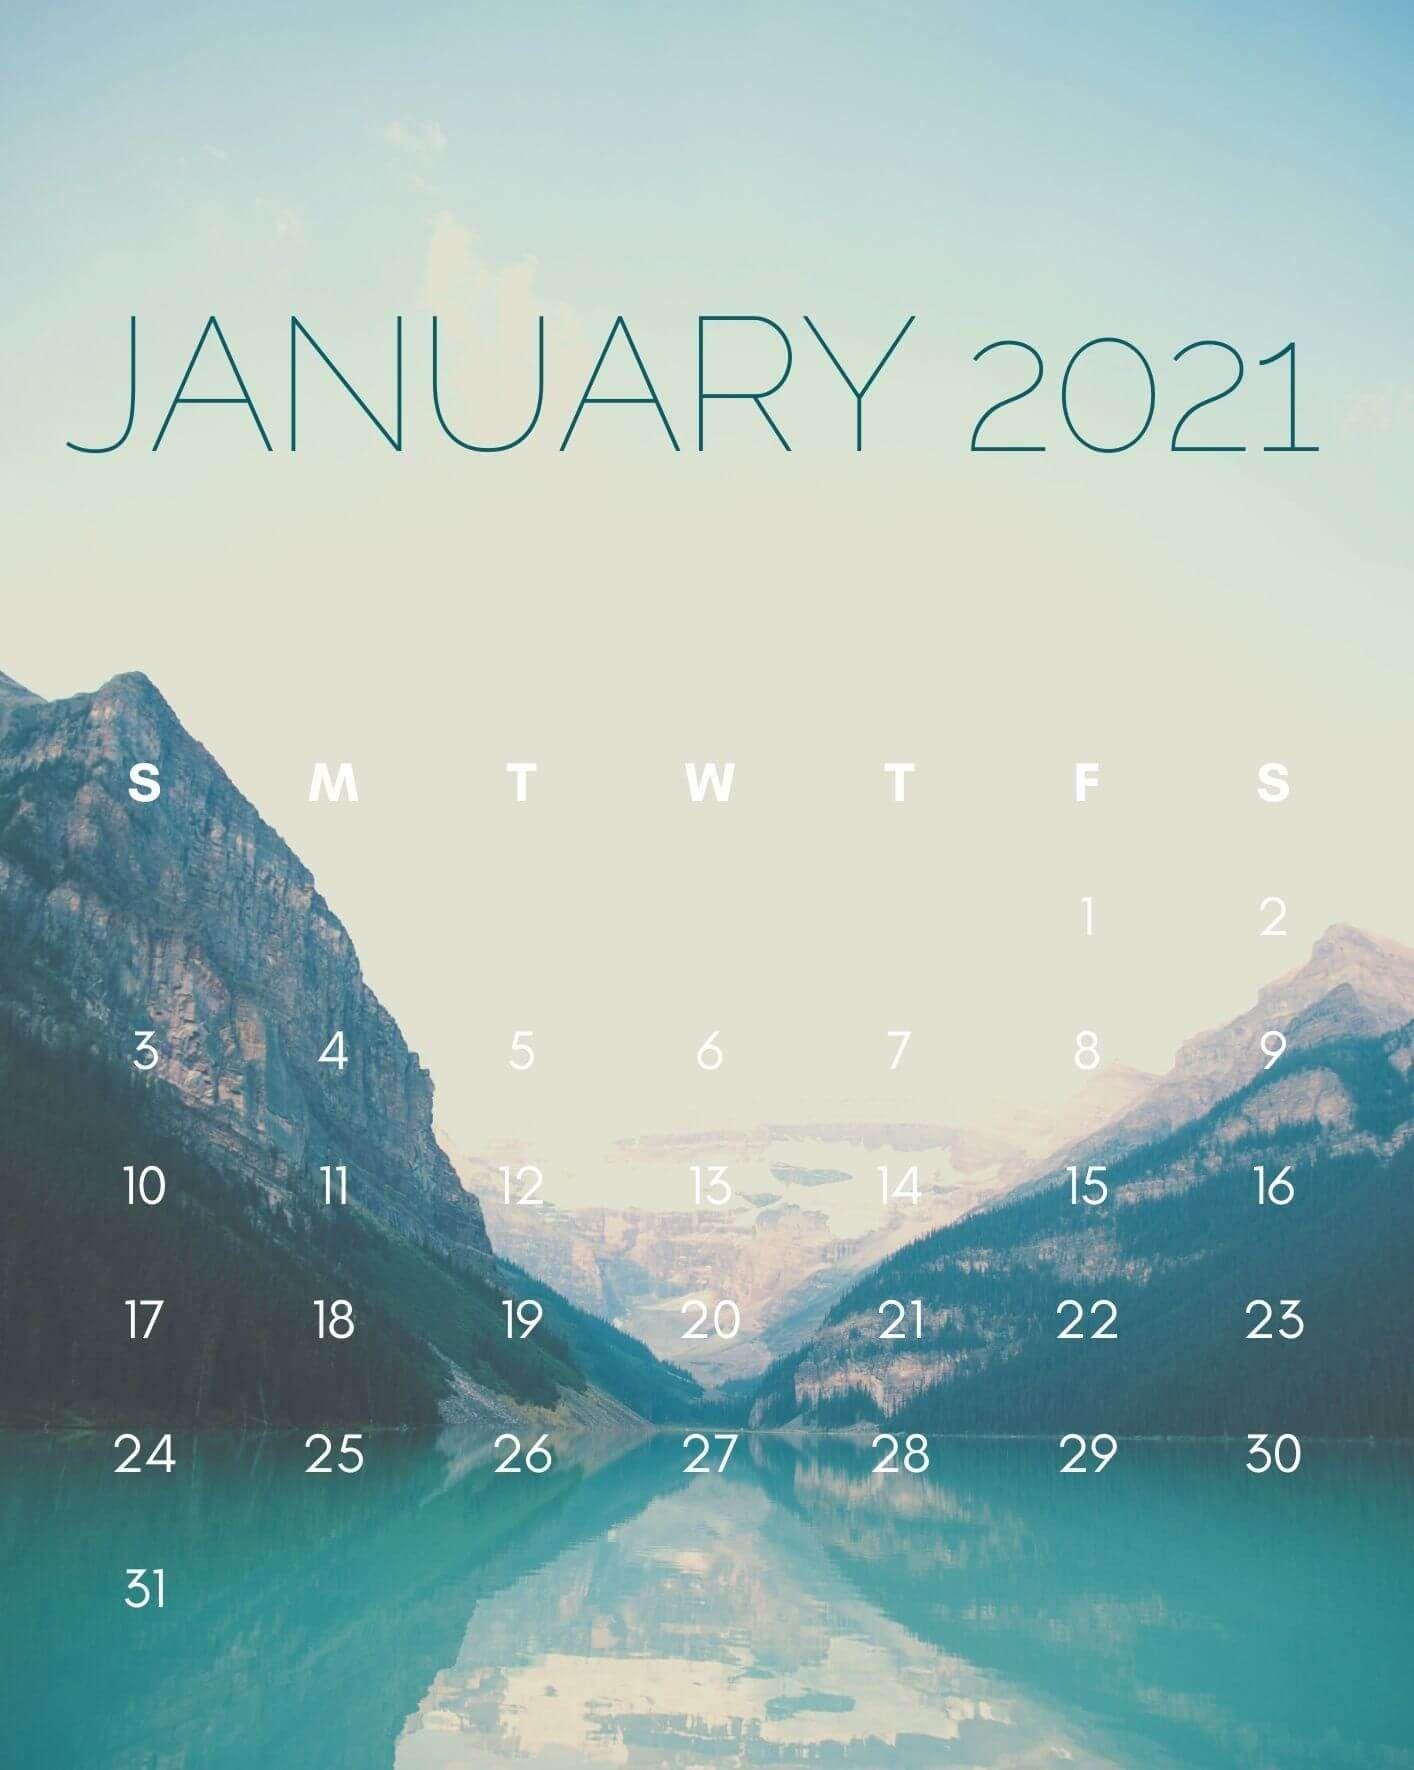 January 2021 Iphone Calendar Wallpaper Calendar Wallpaper Desktop Wallpaper Calendar January Wallpaper